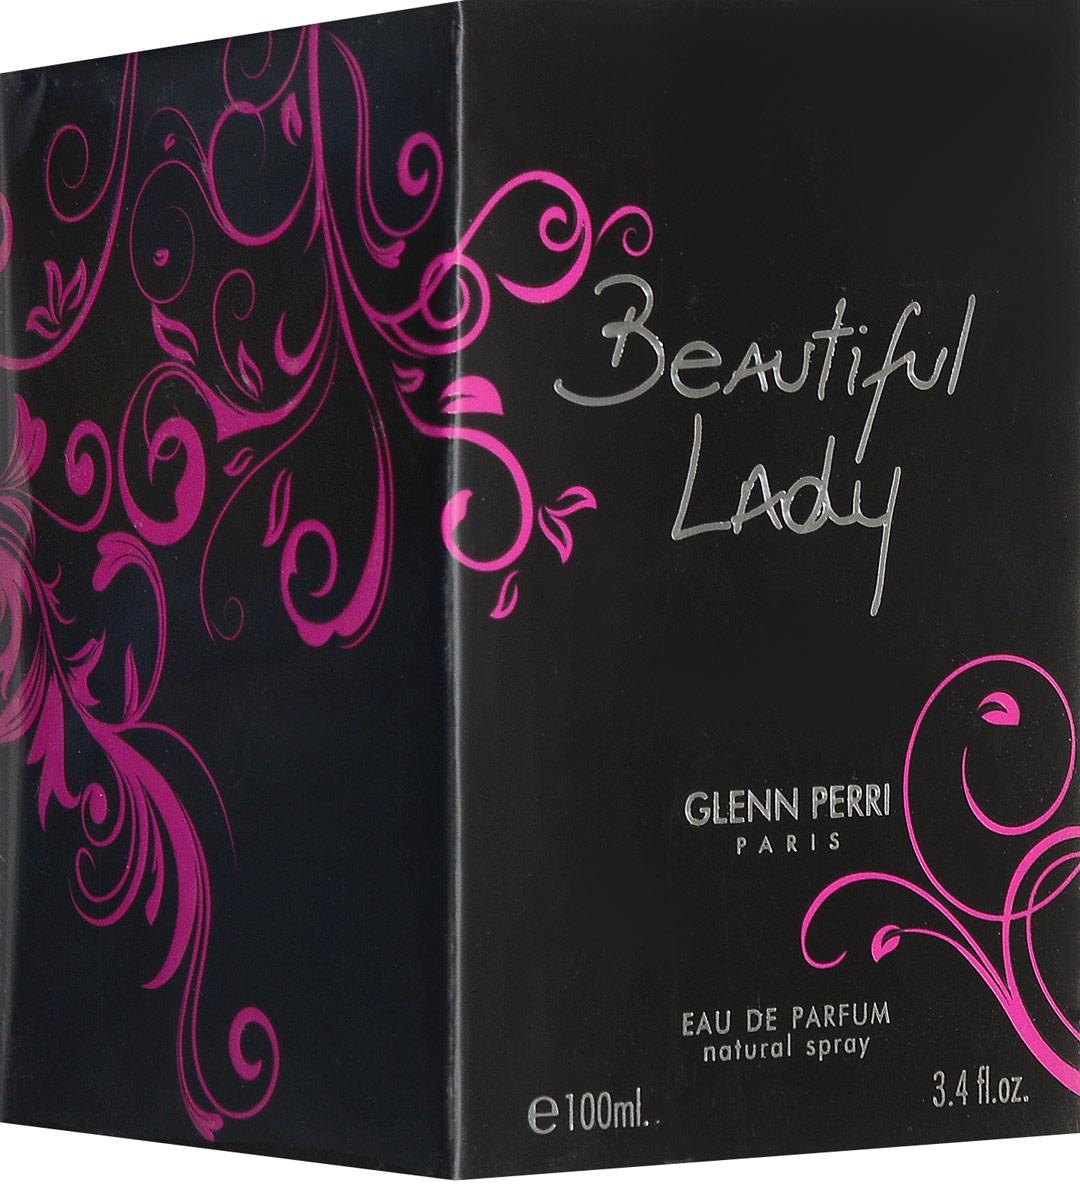 Geparlys Парфюмерная вода Beautiful Lady for women Линии Parfums Glenn Perri, 100 мл geparlys beautiful lady